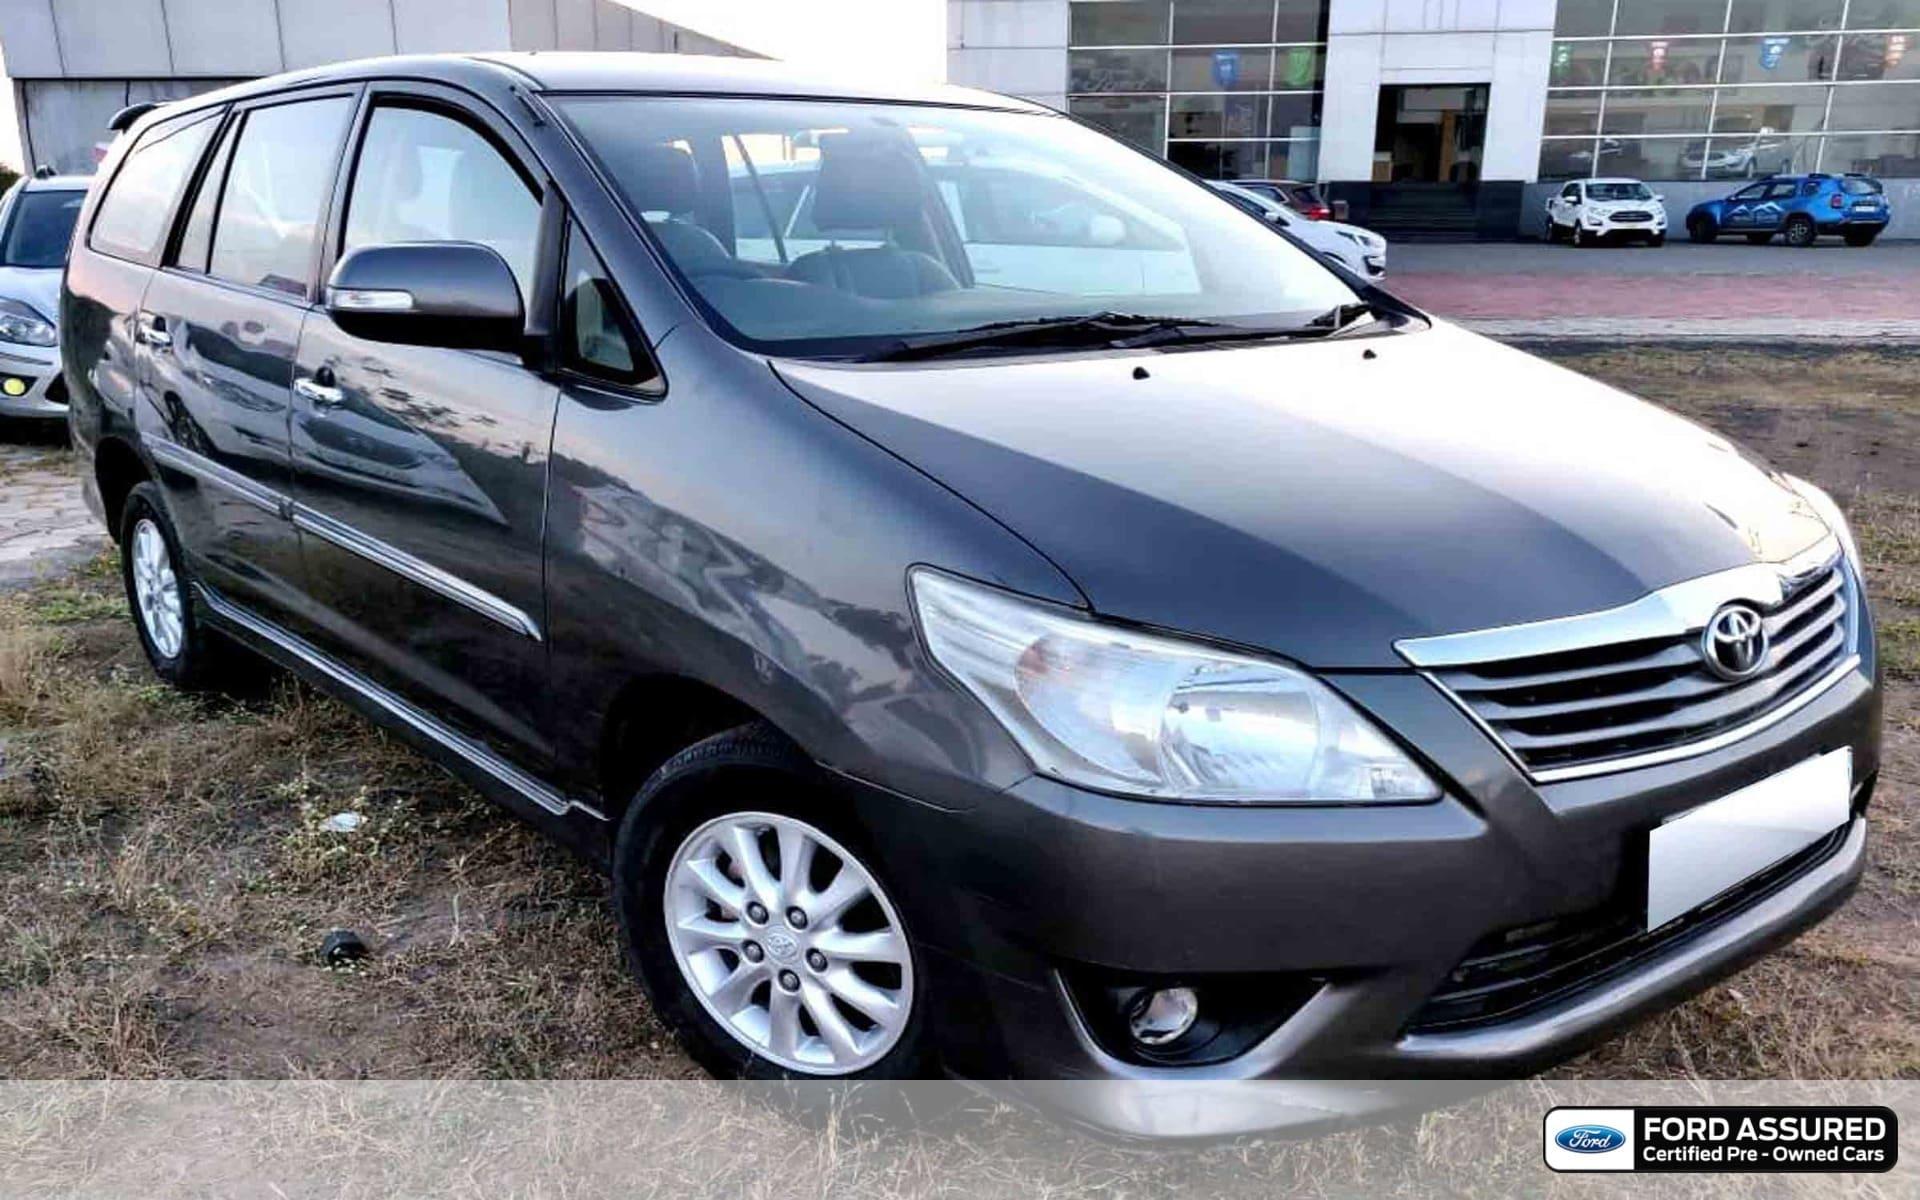 Toyota Innova 2012-2013 2.5 EV (Diesel) MS 7 Seater BS IV